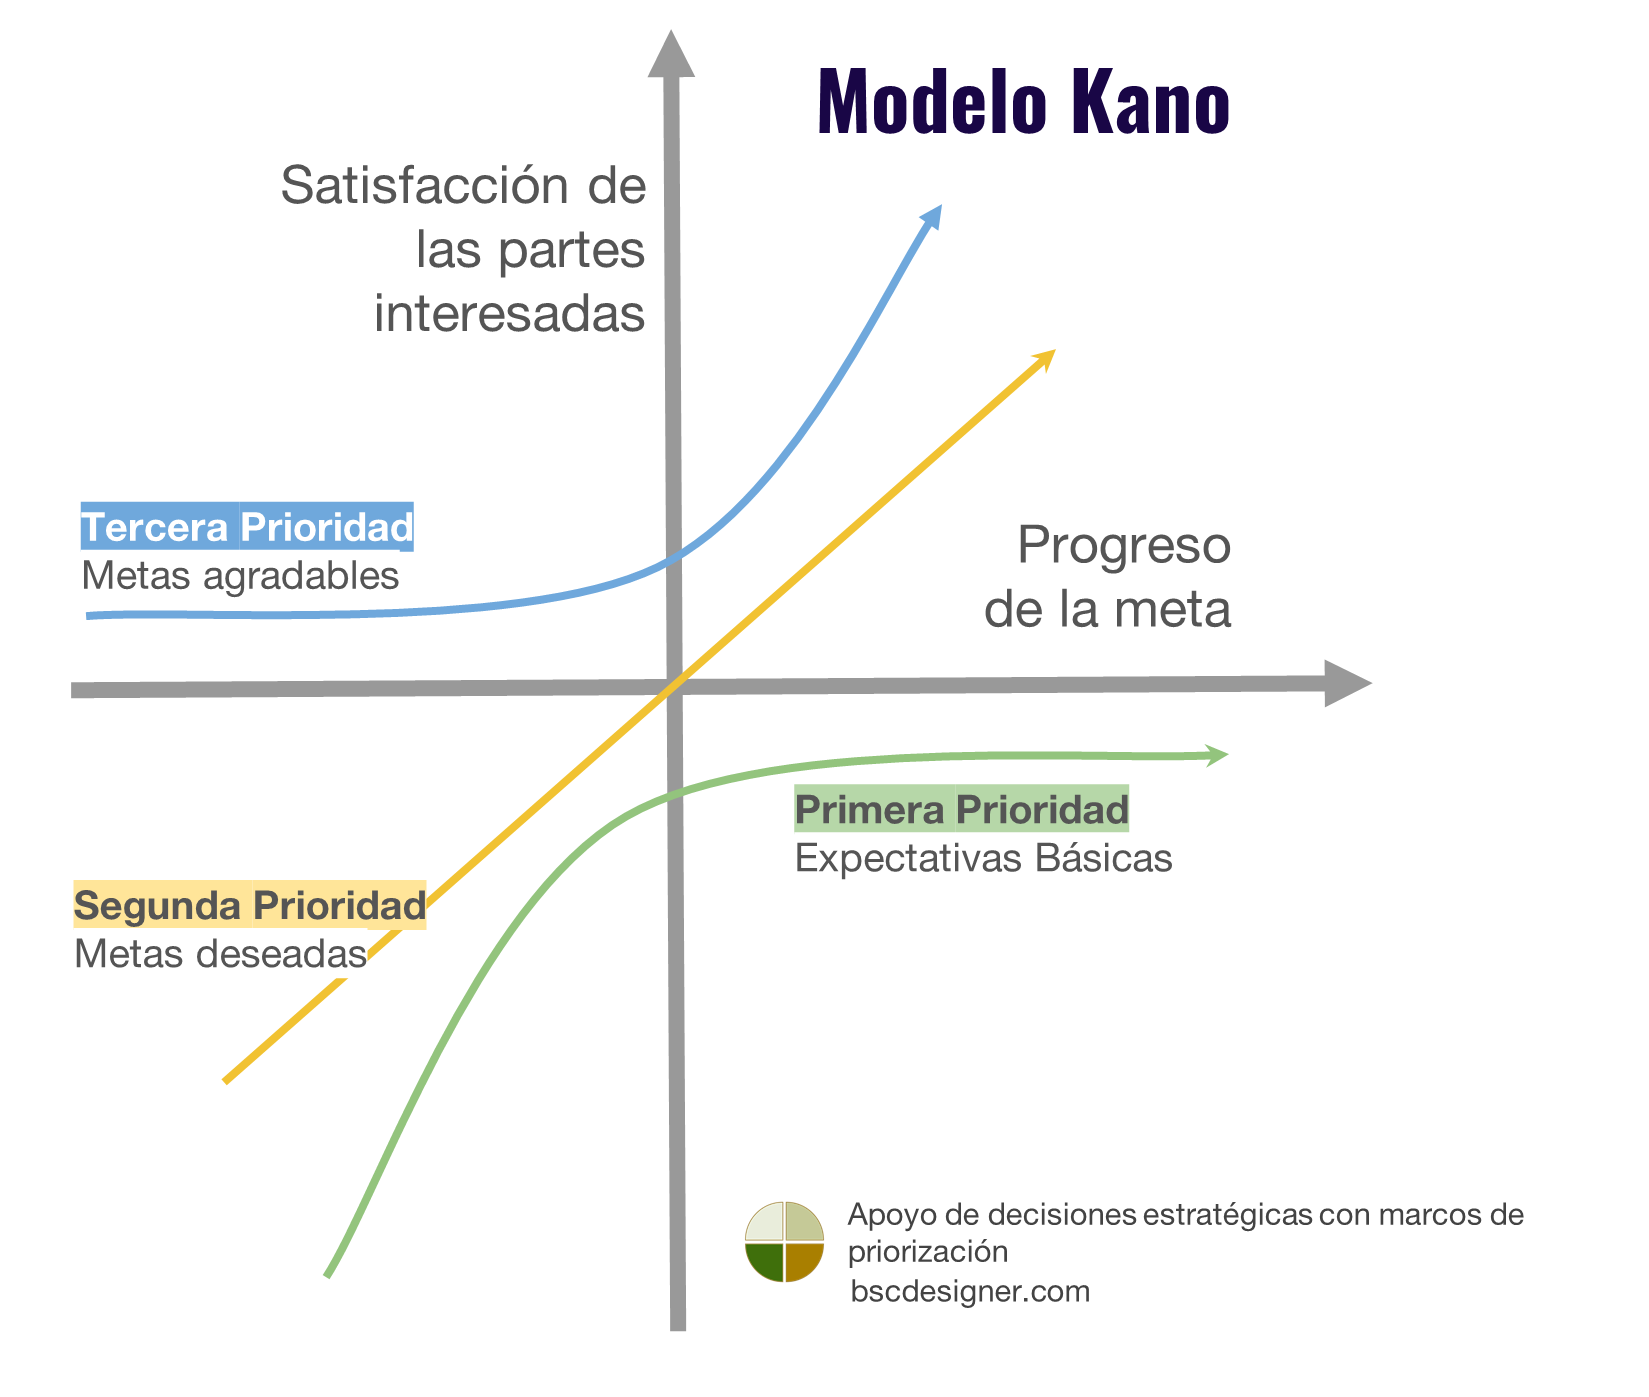 Gráfico del modelo Kano